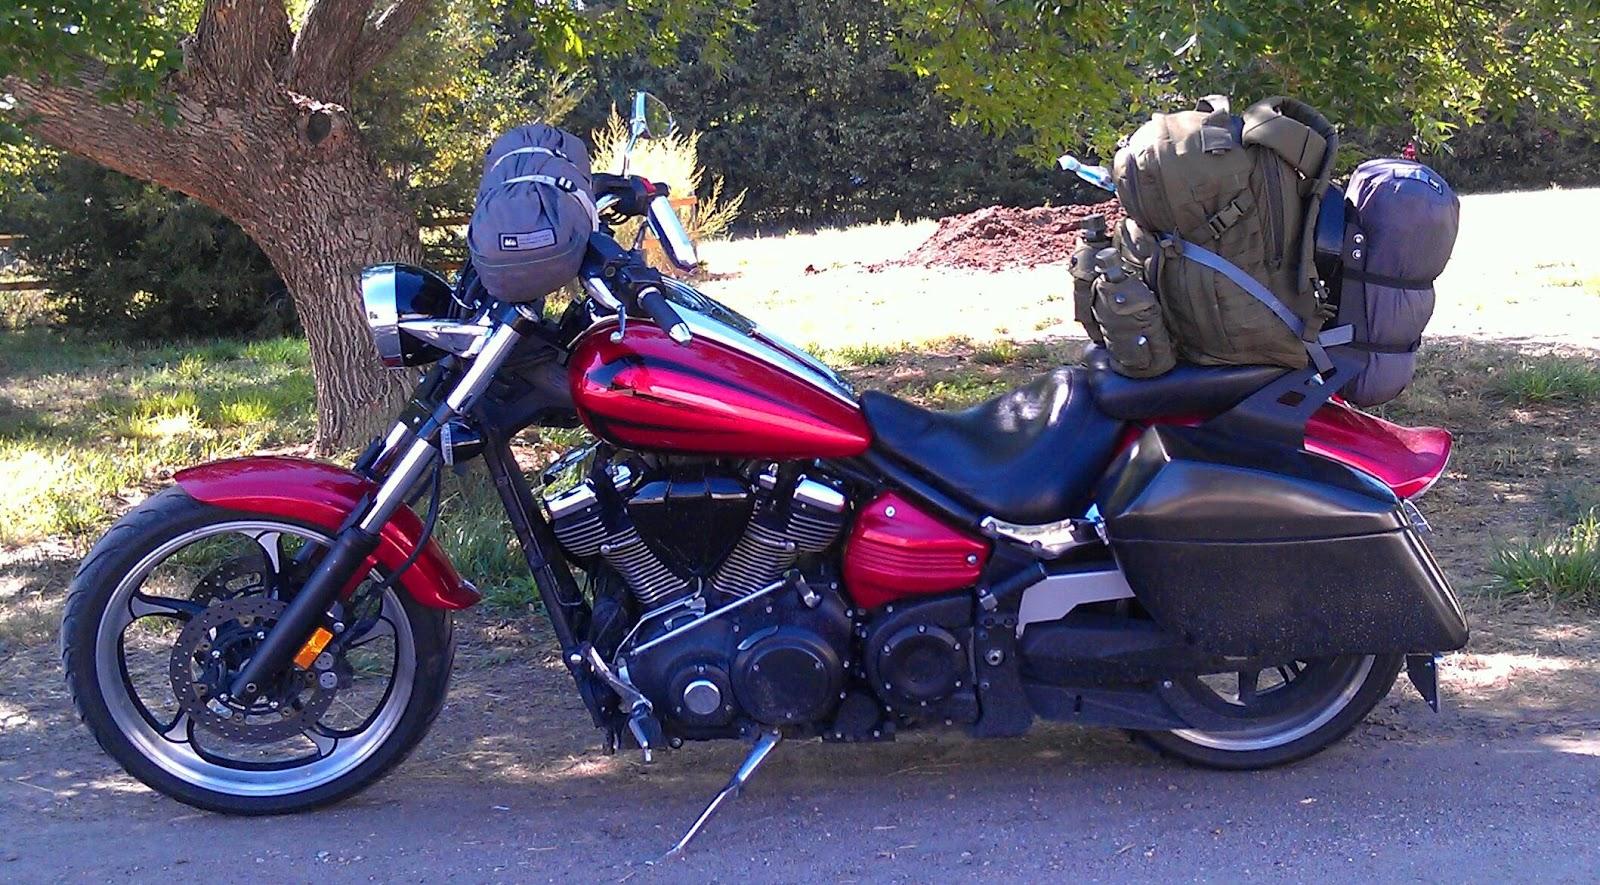 Ribbon of highway august 2014 for Yamaha raider hard saddlebags